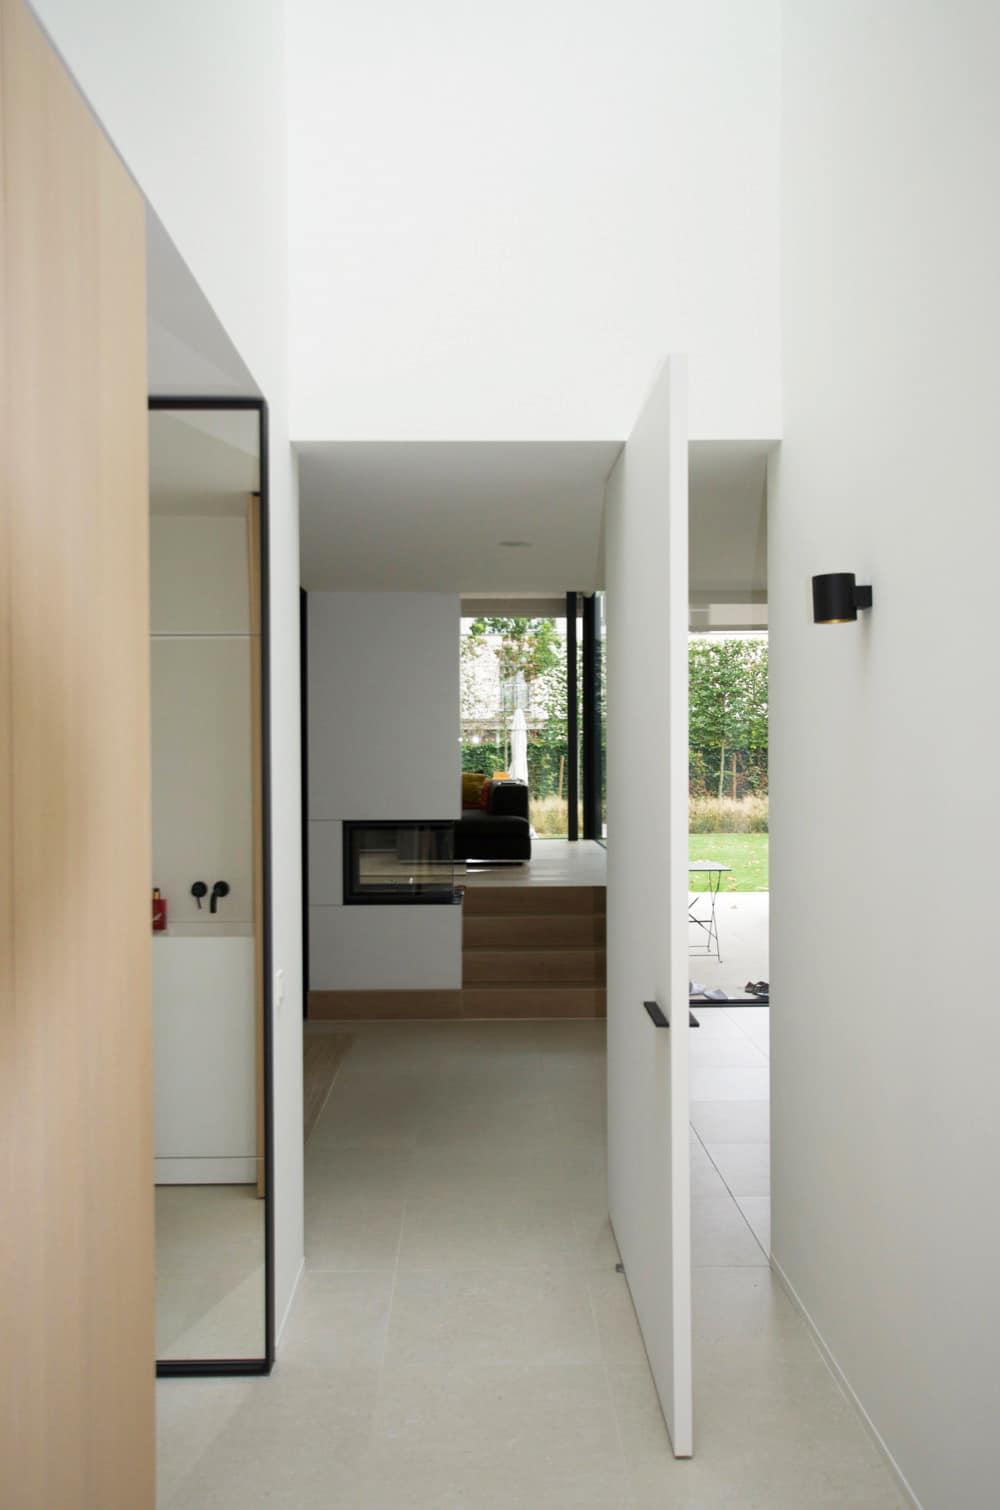 dro 12 | Baeyens & Beck architecten Gent | architect nieuwbouw renovatie interieur | high end | architectenbureau